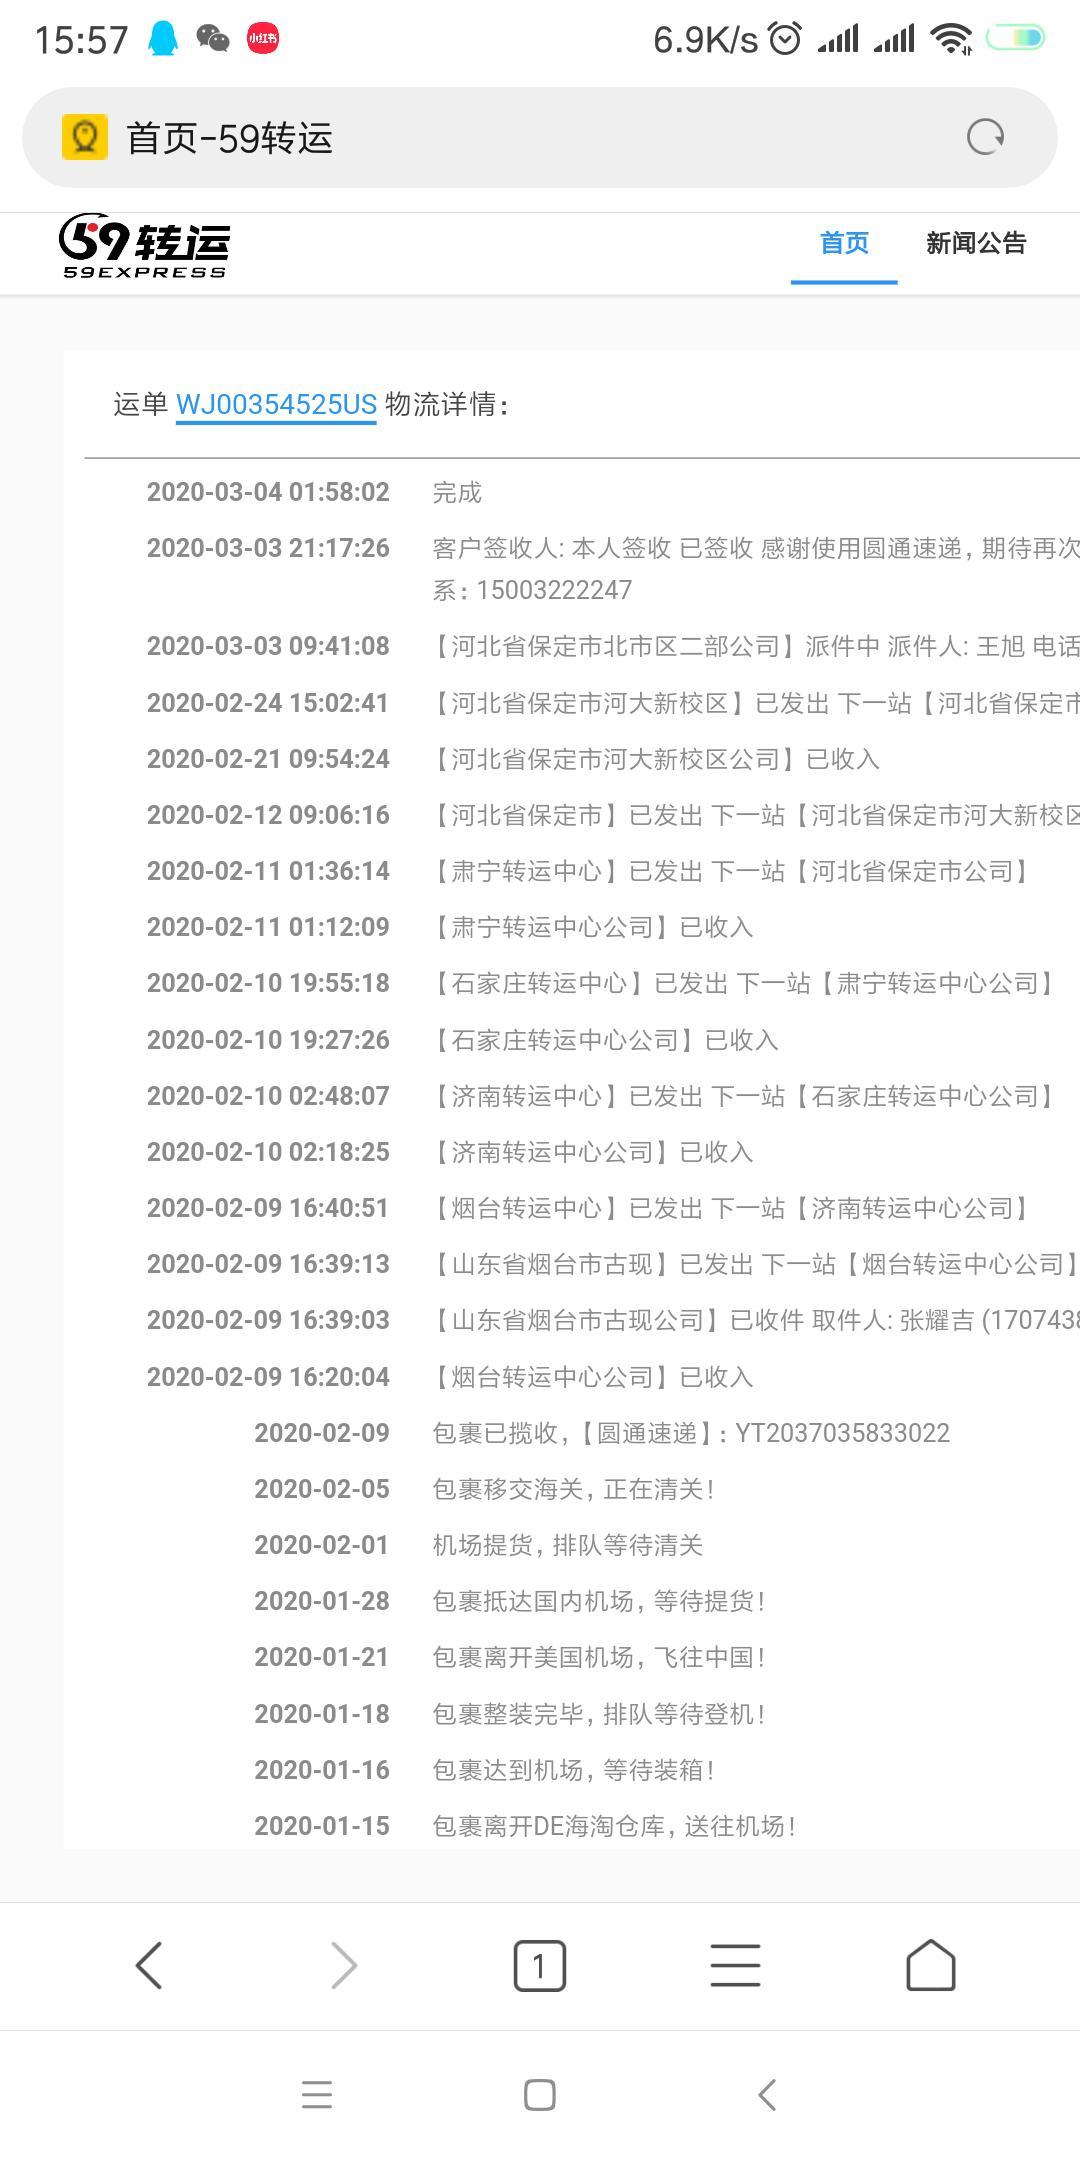 Screenshot_2020-03-06-15-57-15-062_com.android.browser.png